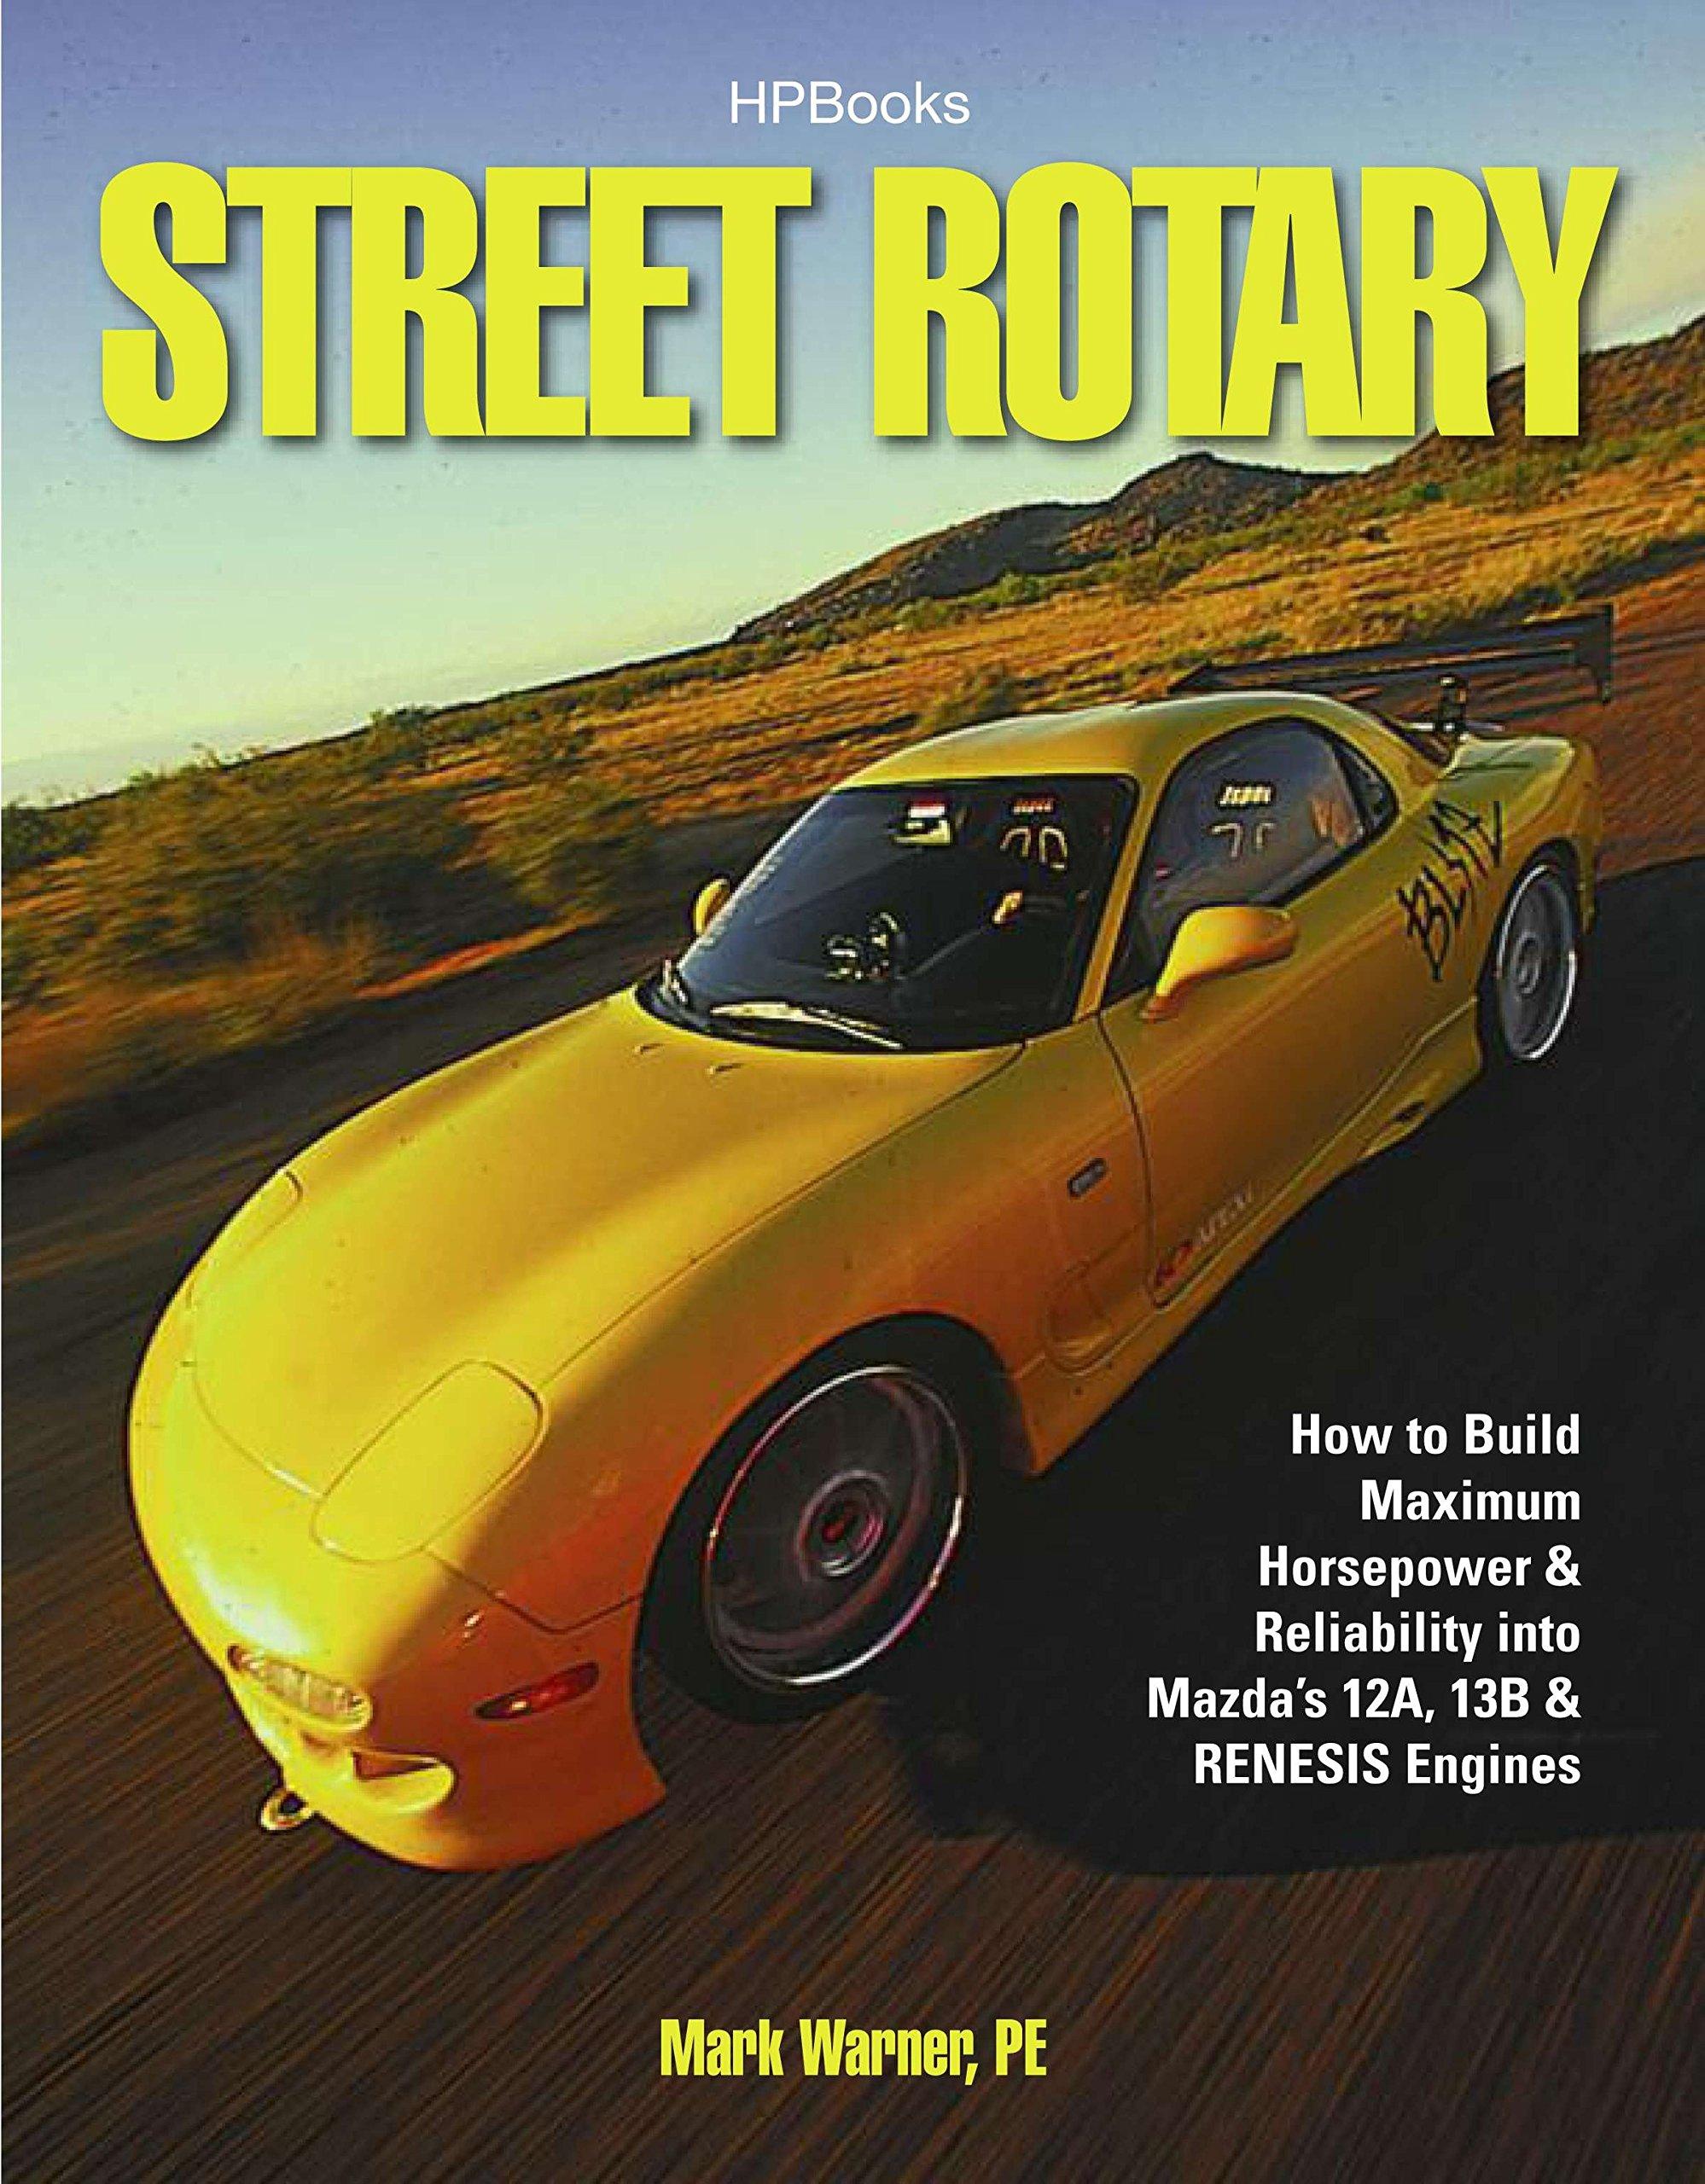 Street Rotary HP1549: How to Build Maximum Horsepower